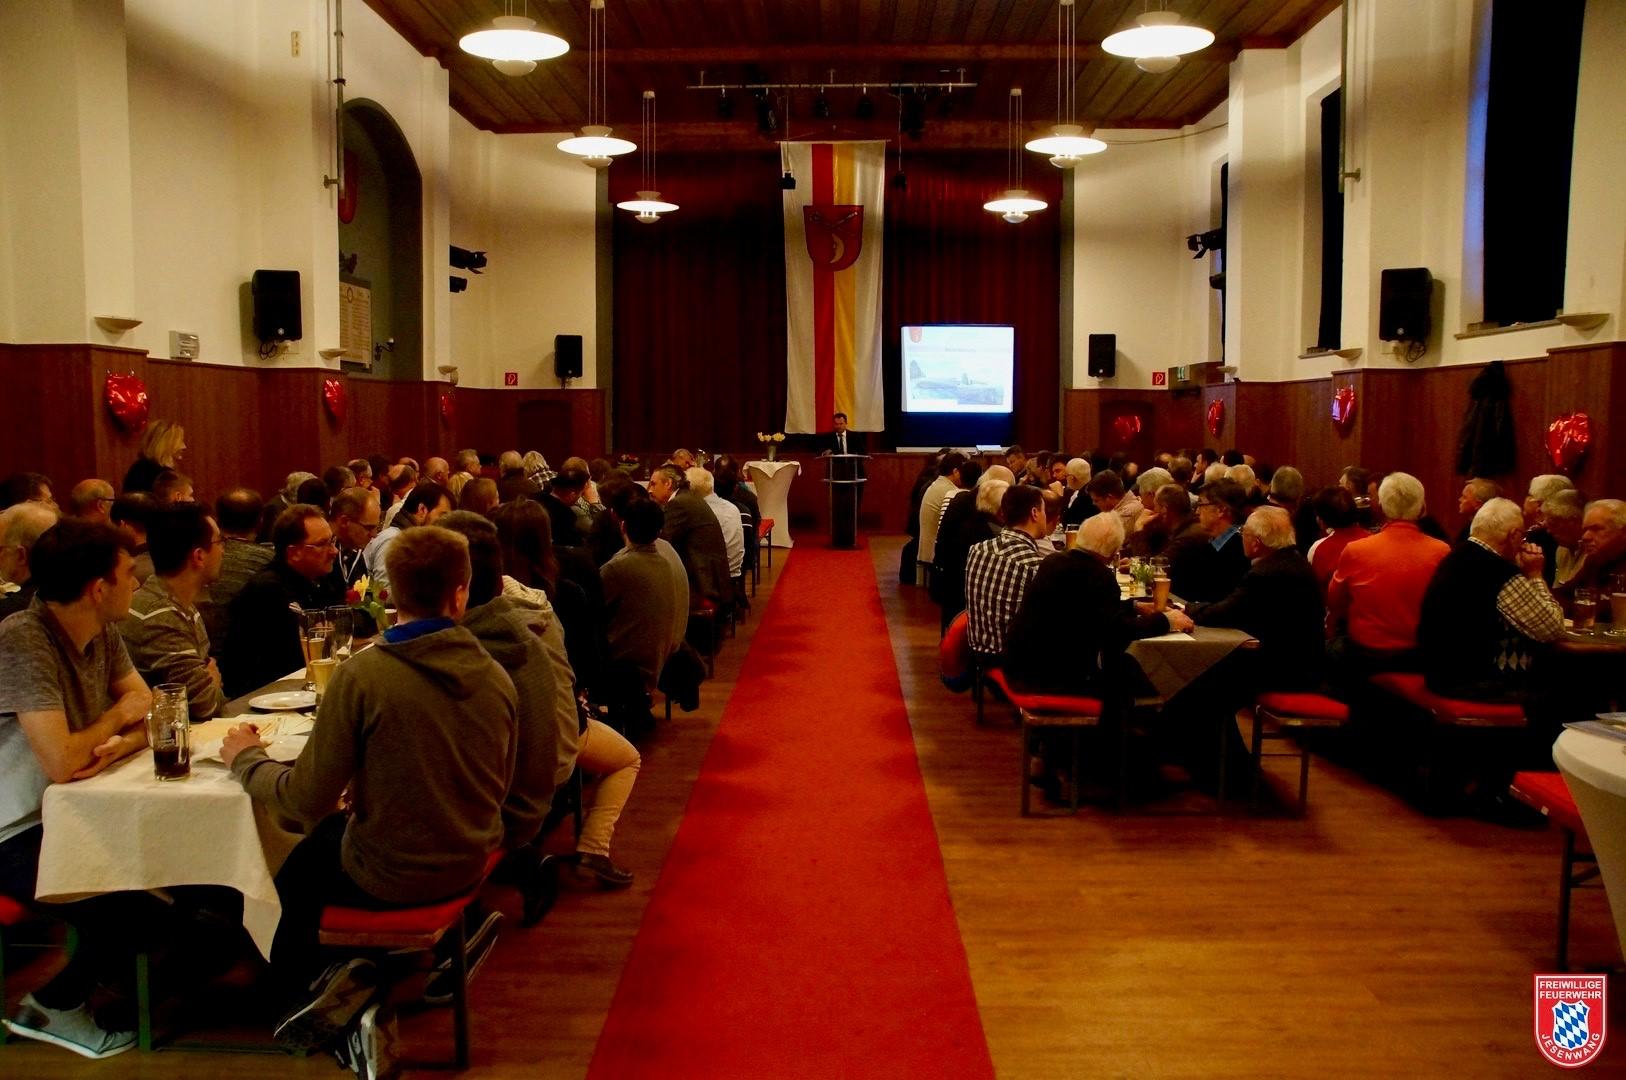 Bürgerversammlung 2019 im Gemeinschaftshaus Jesenwang